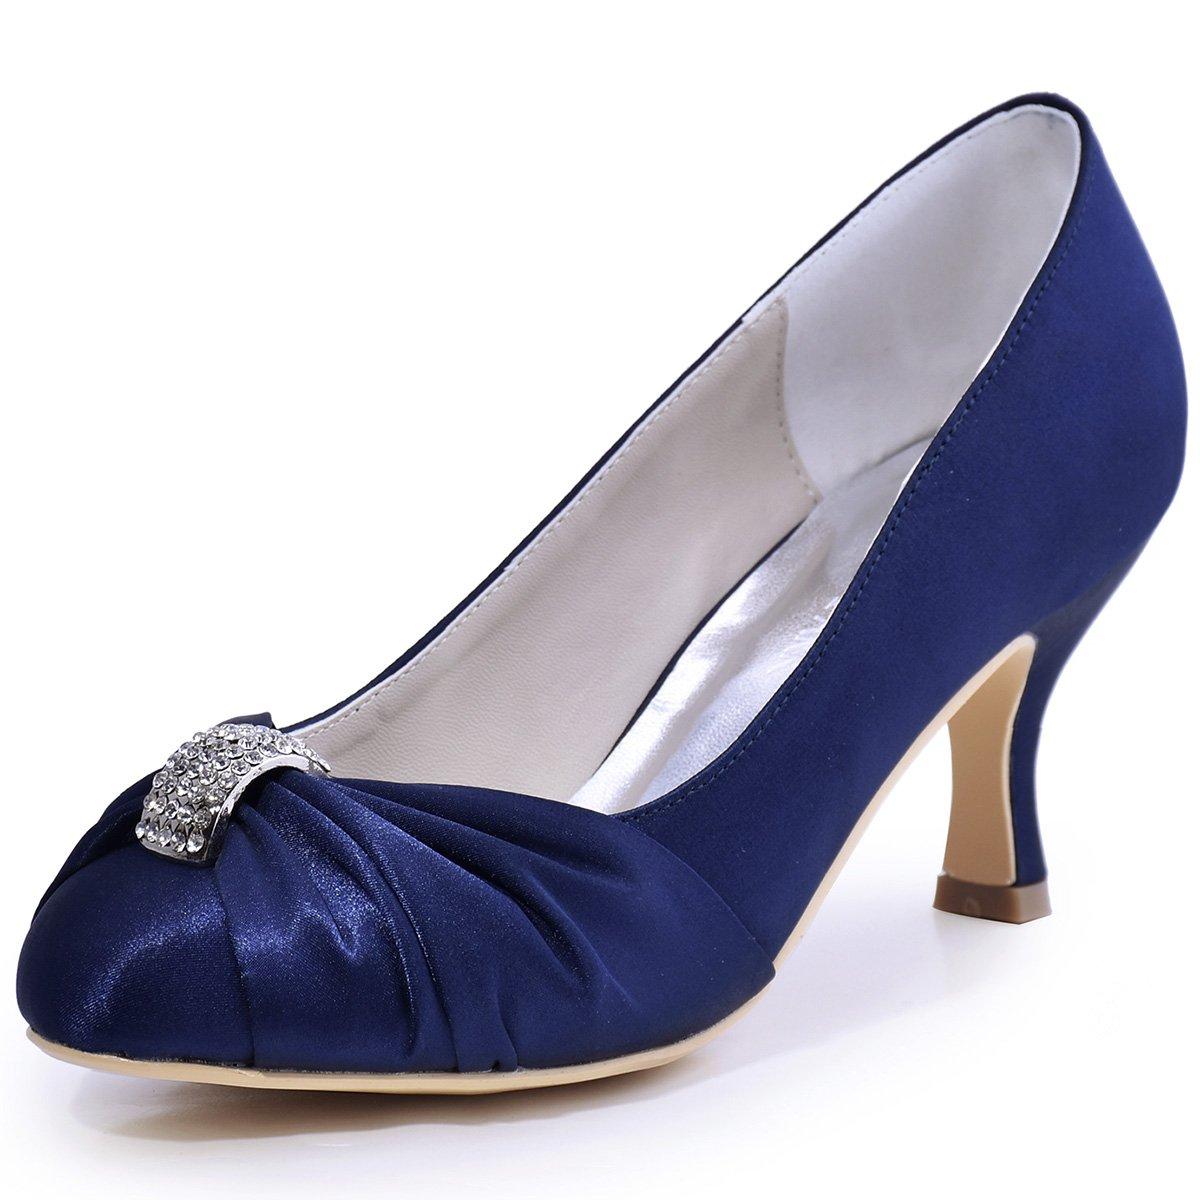 ElegantPark HC1526 Women Pumps Mid Heel Rhinestones Closed Toe Satin Evening Prom Wedding Shoes Navy Blue US 8